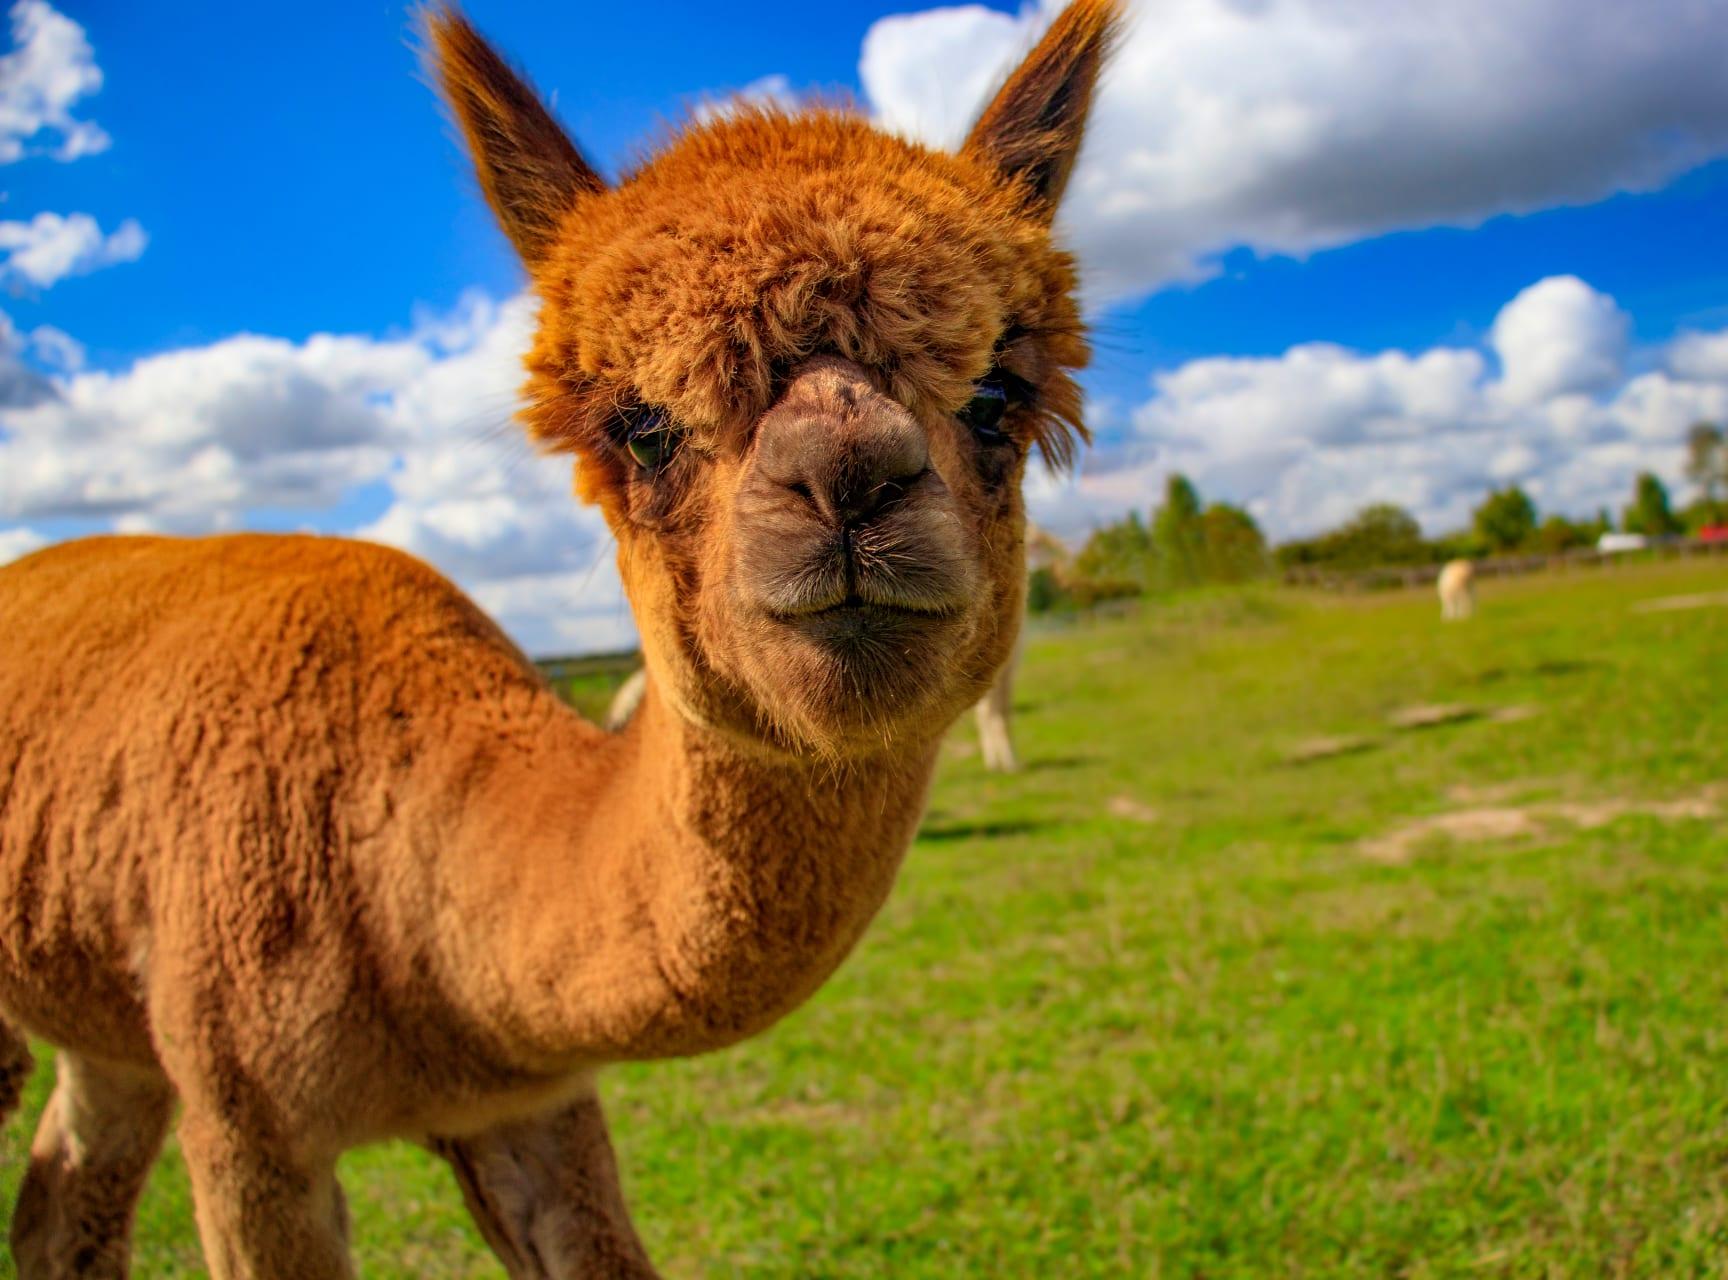 Leiden - Alpacas in the Lowlands: Meet the Mild-Mannered Mammals